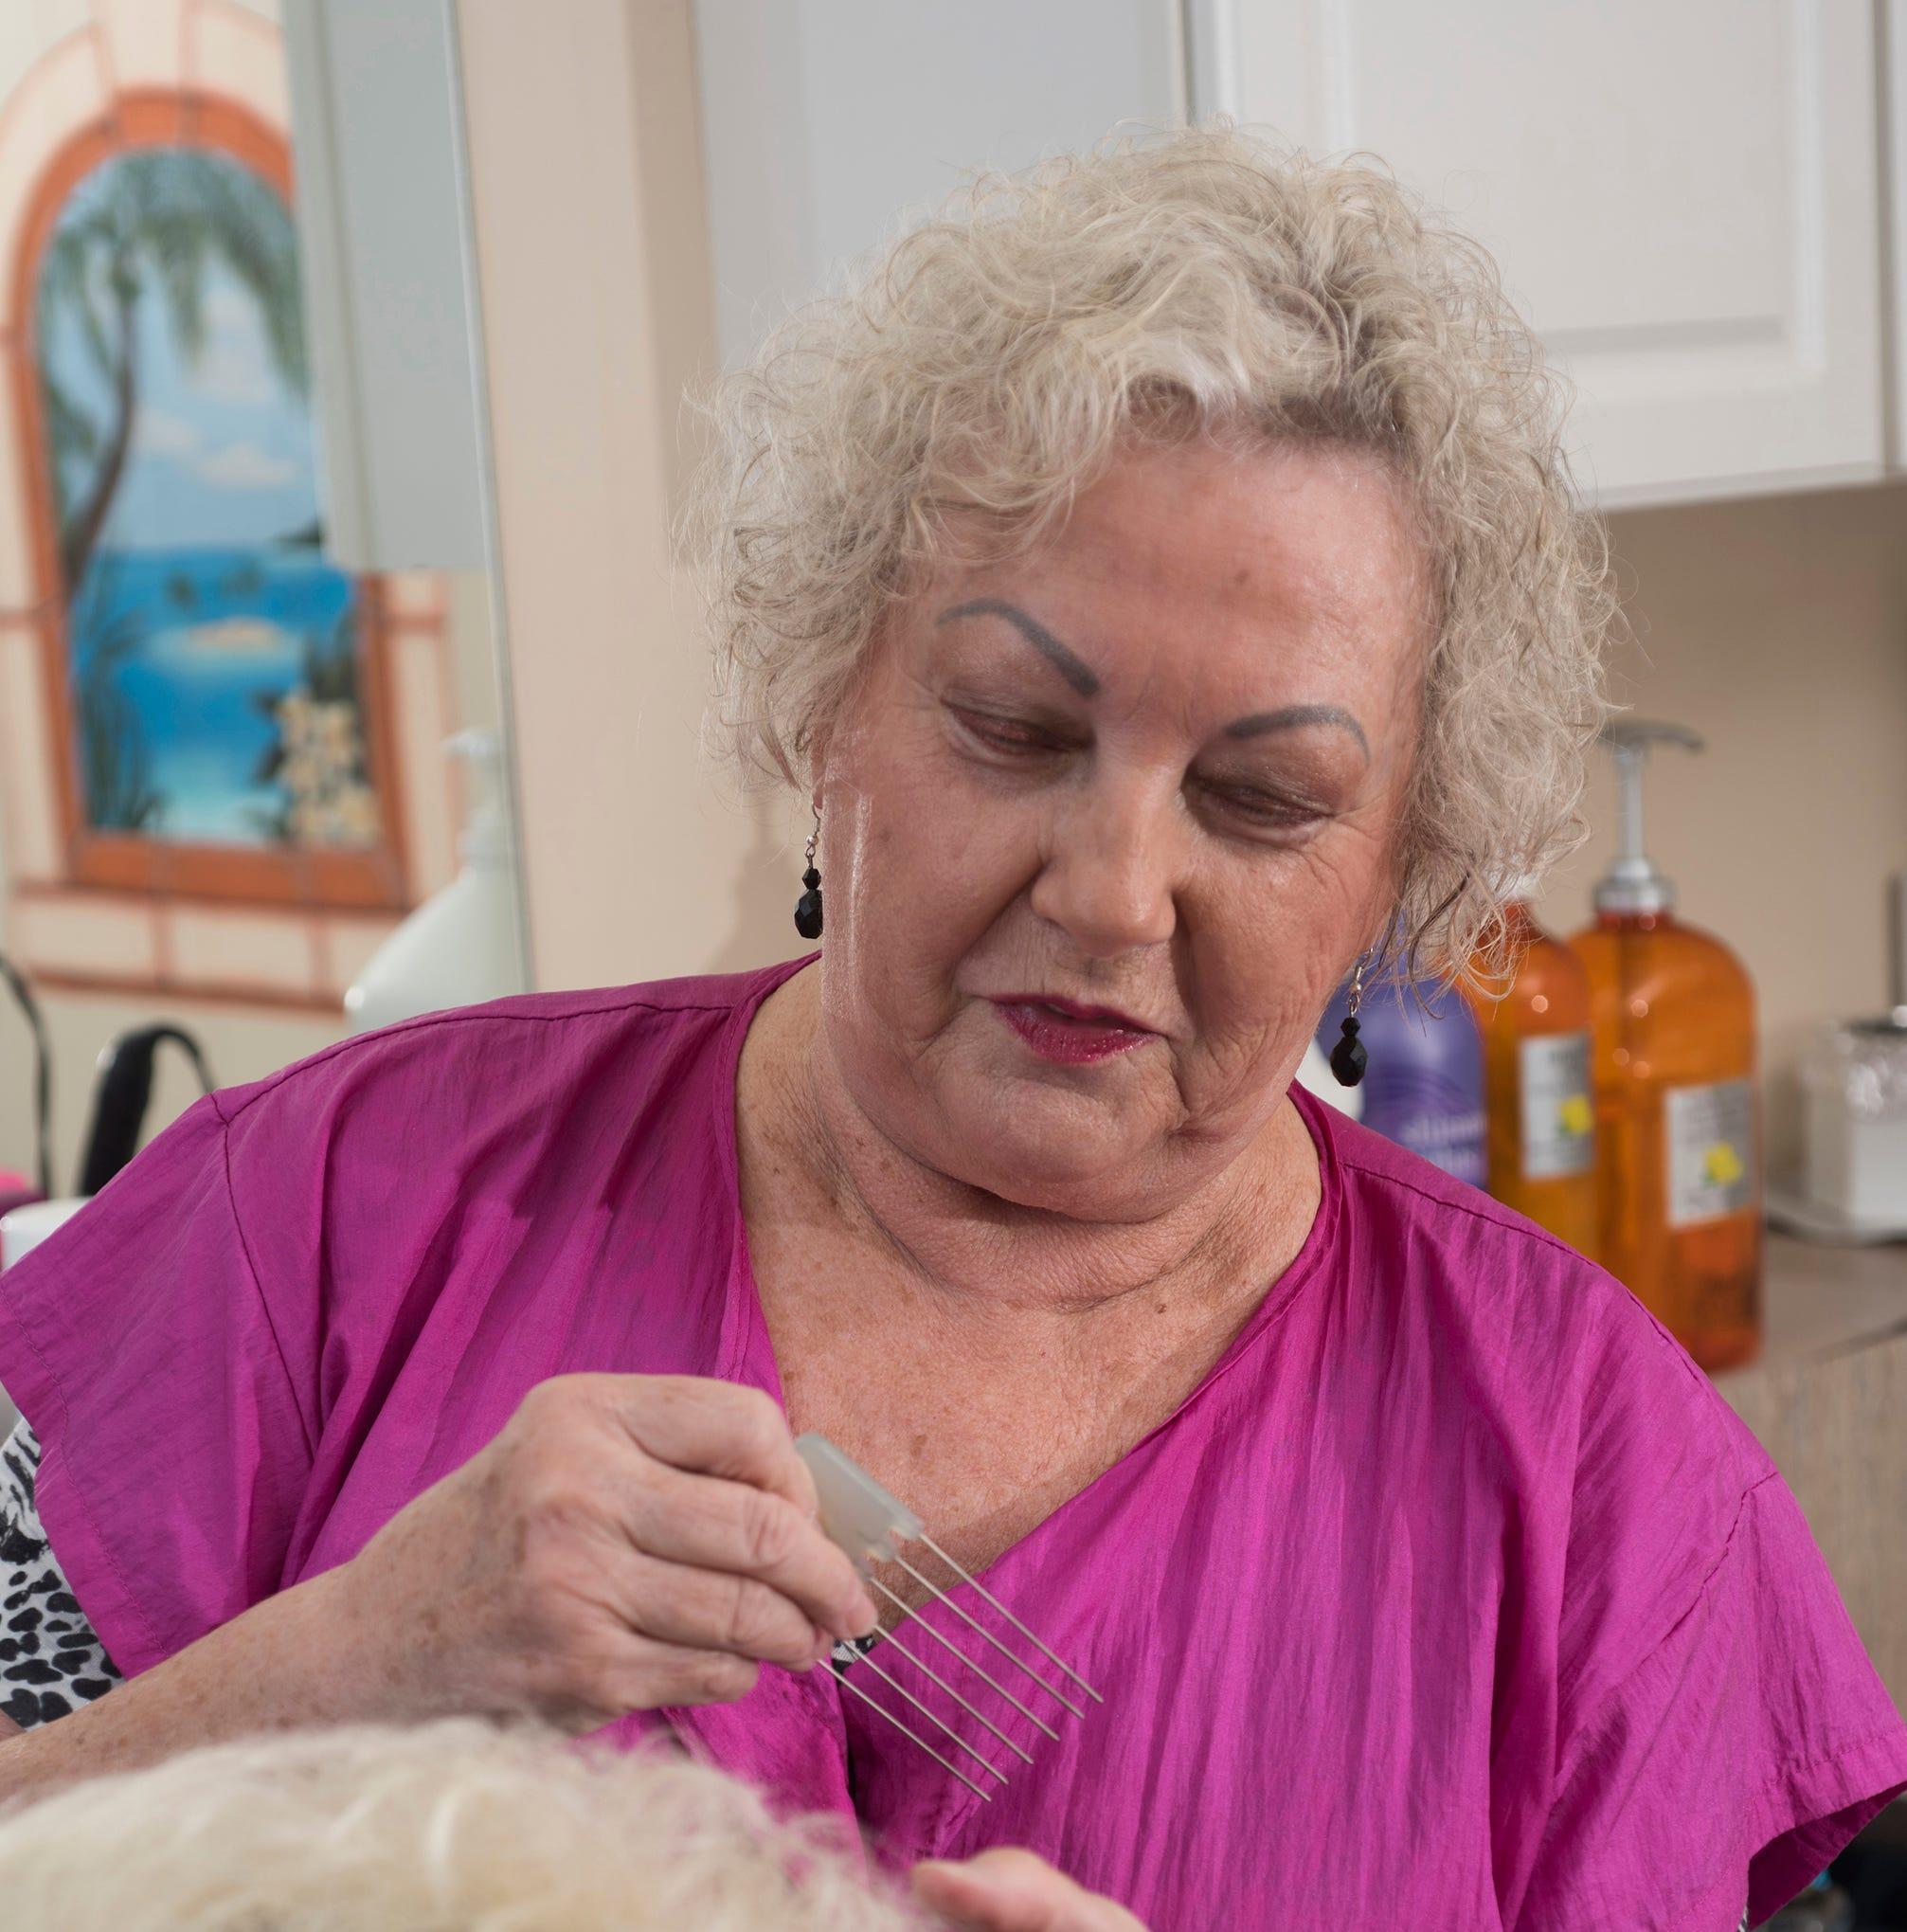 Beauty salon has 50-year history in Warrington